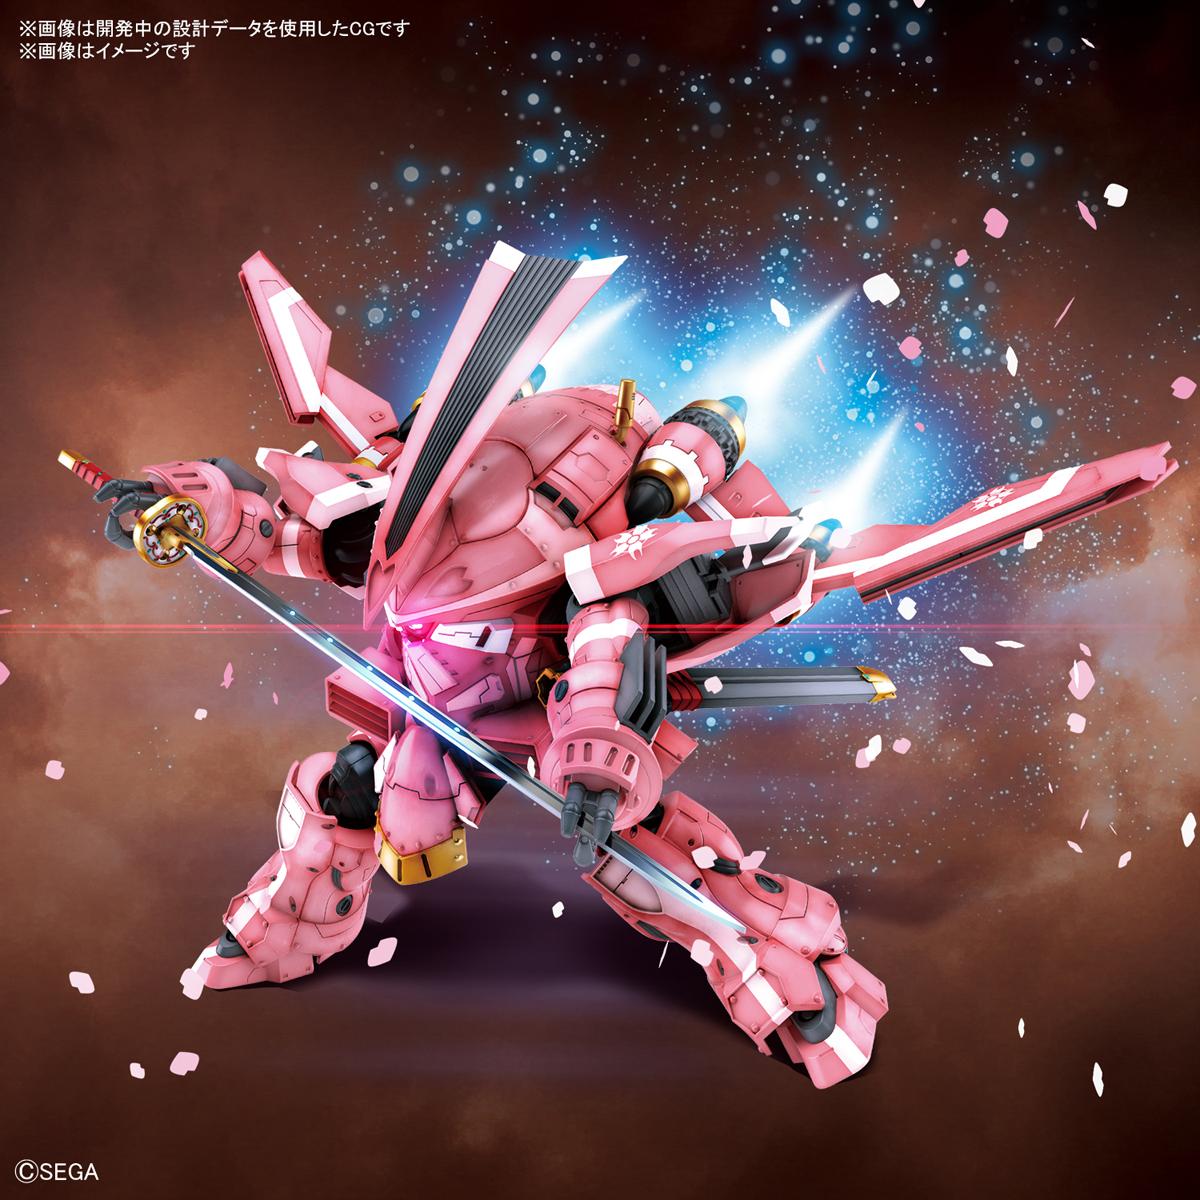 HG 1/24『霊子戦闘機・試製桜武(天宮さくら機)』新サクラ大戦 プラモデル-002